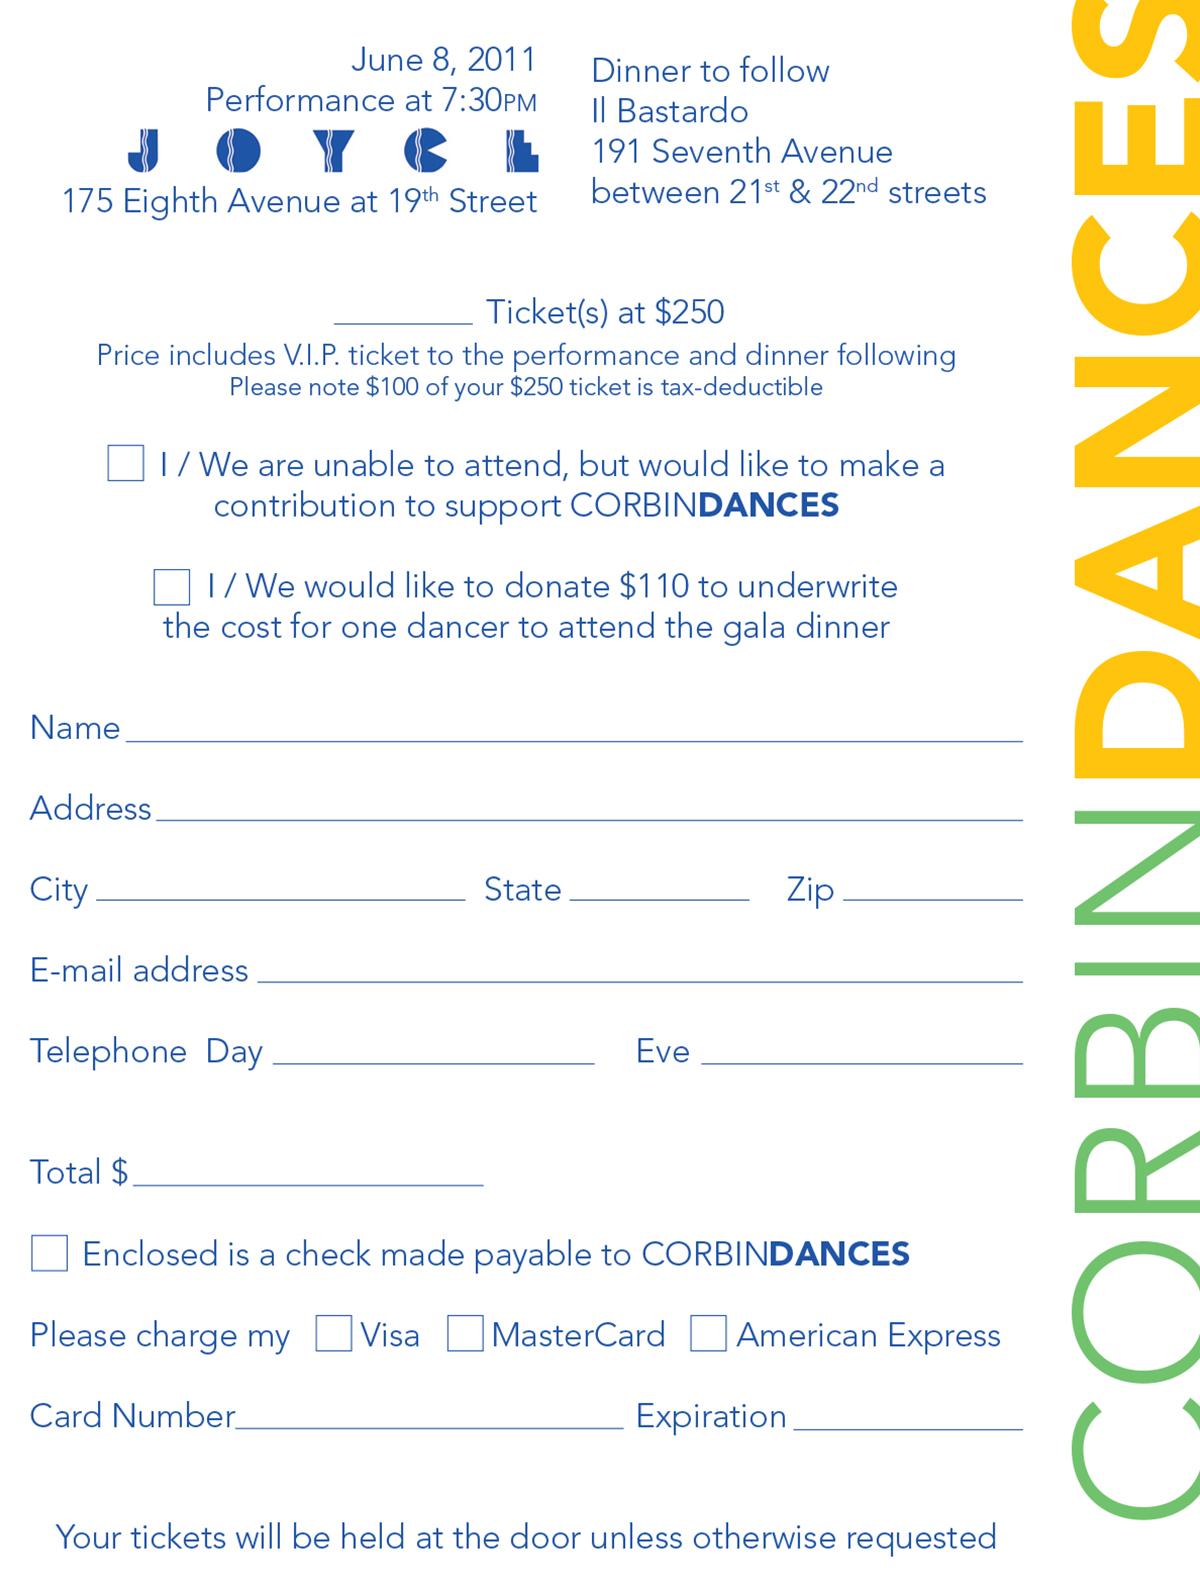 CorbinDances 2011 Invitation - RSVP Card Back